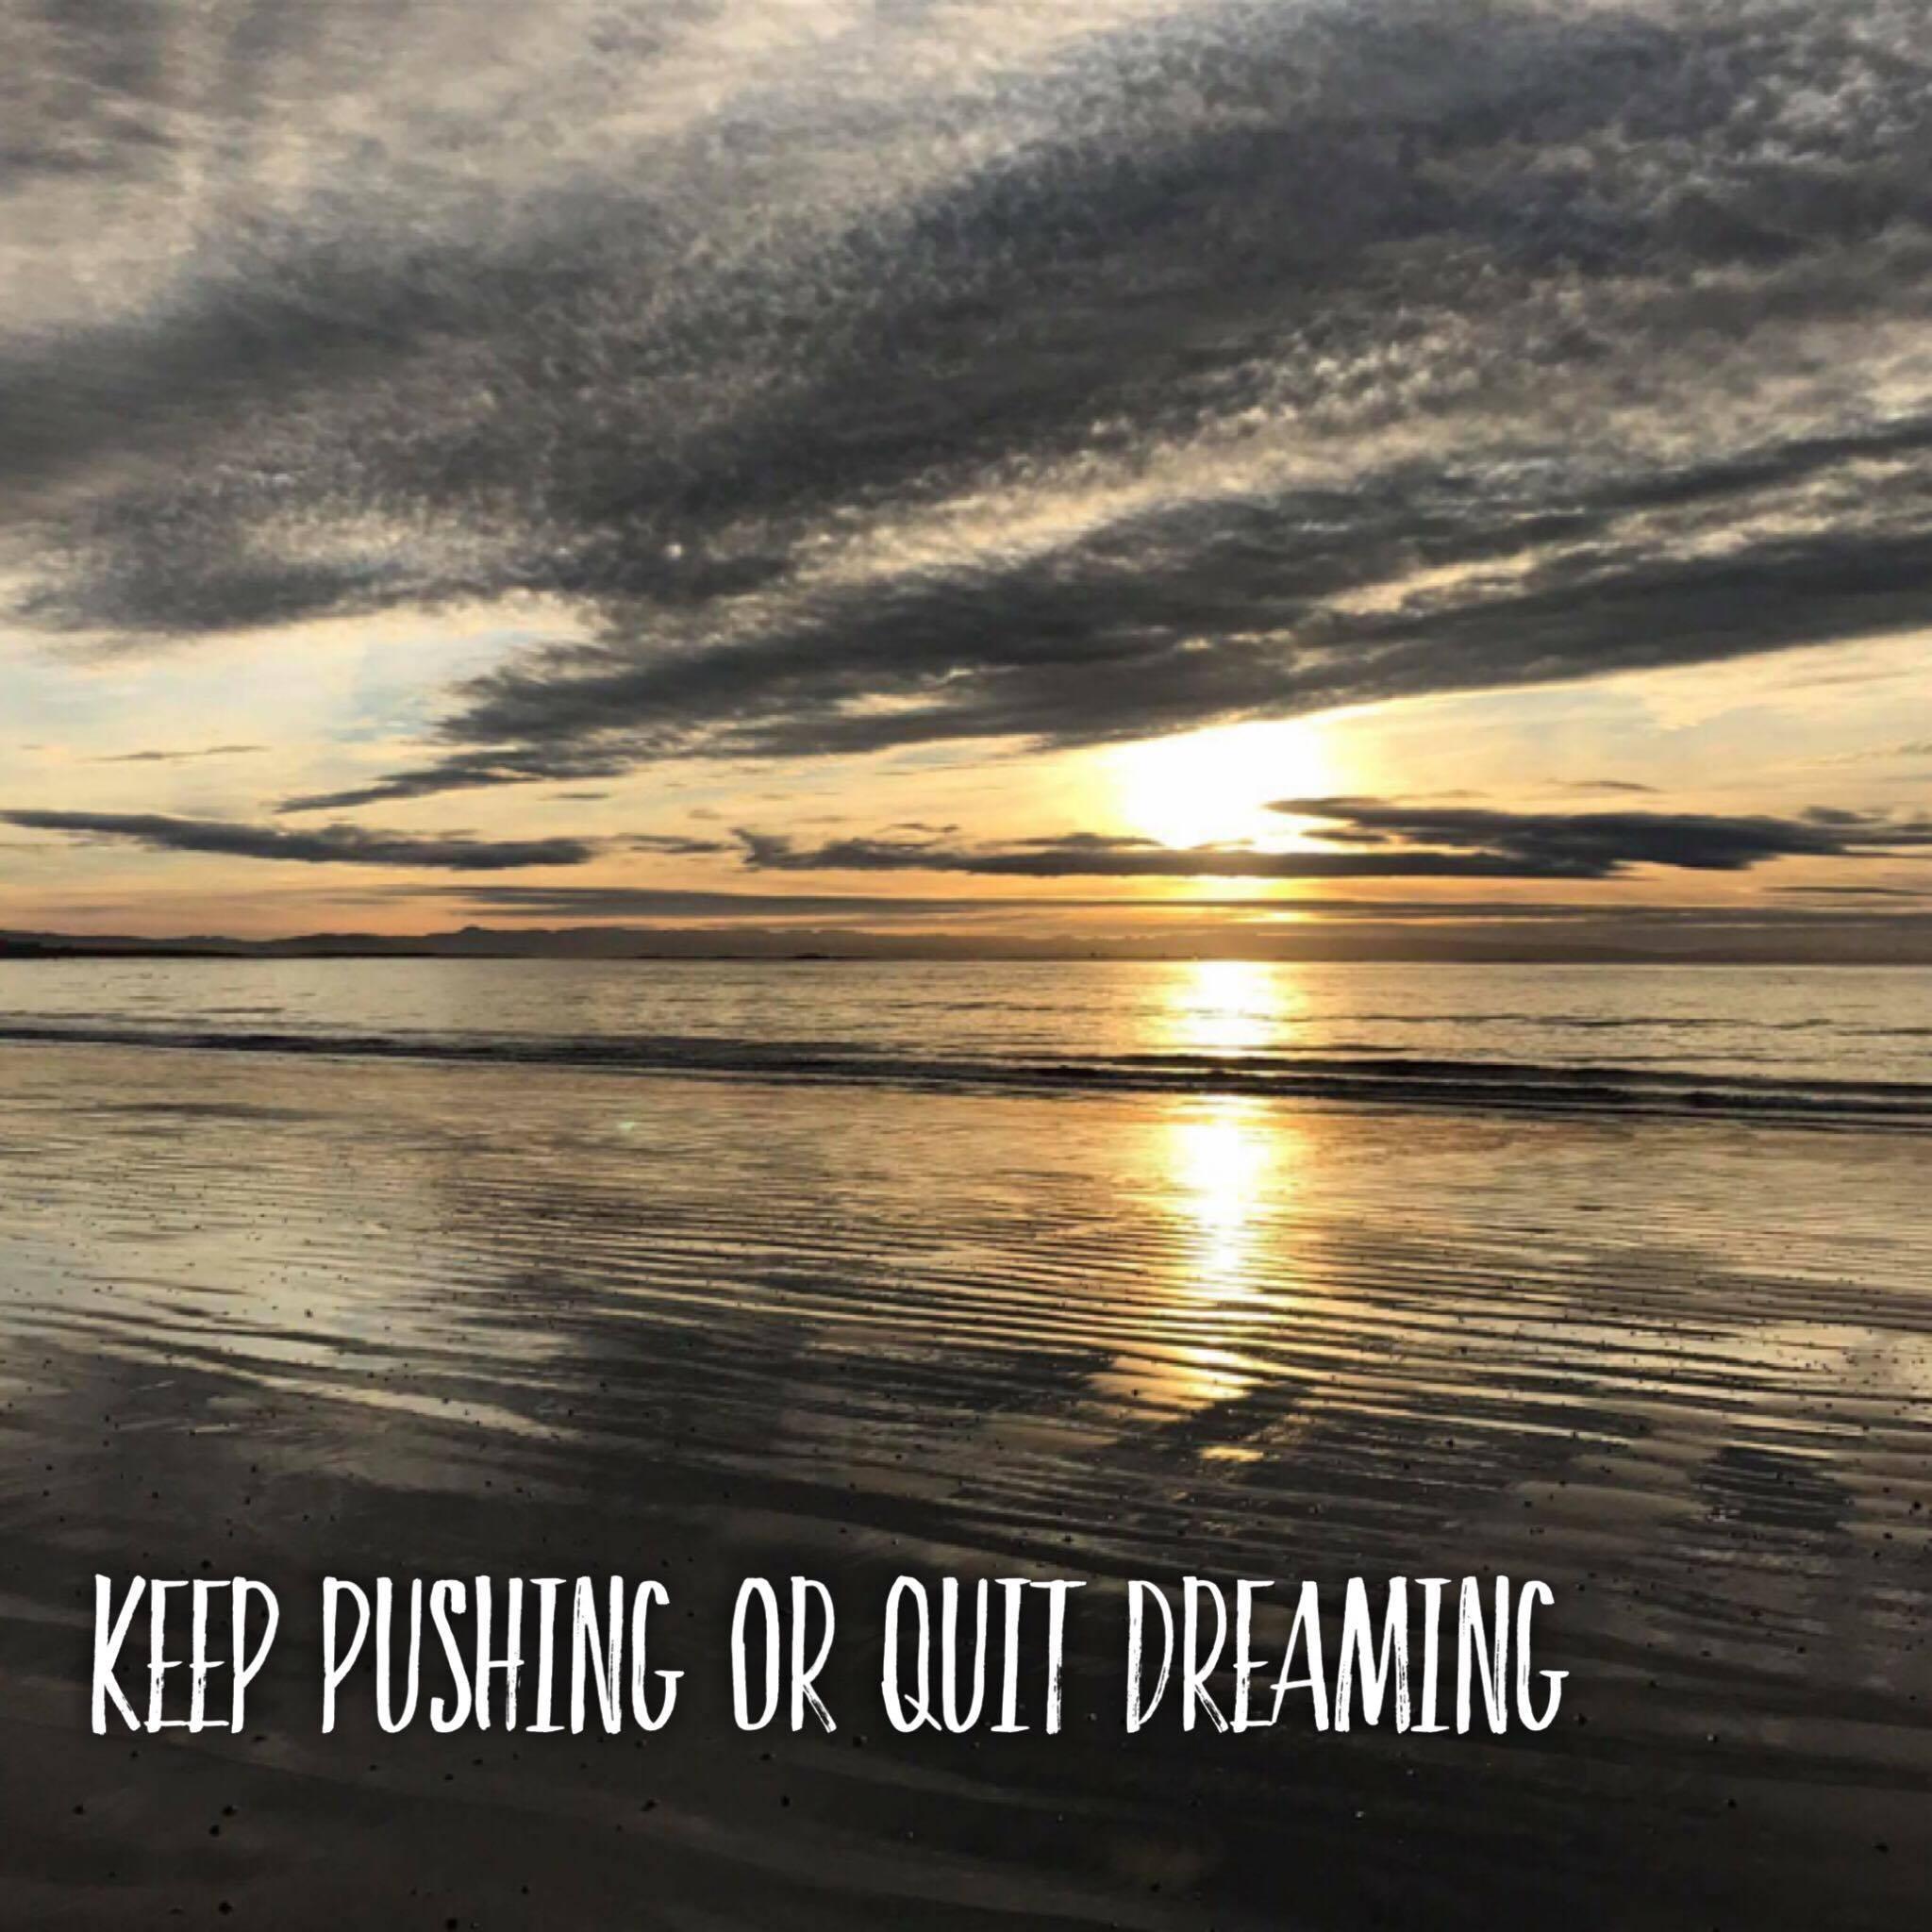 Keep Pushing or Quit Dreaming